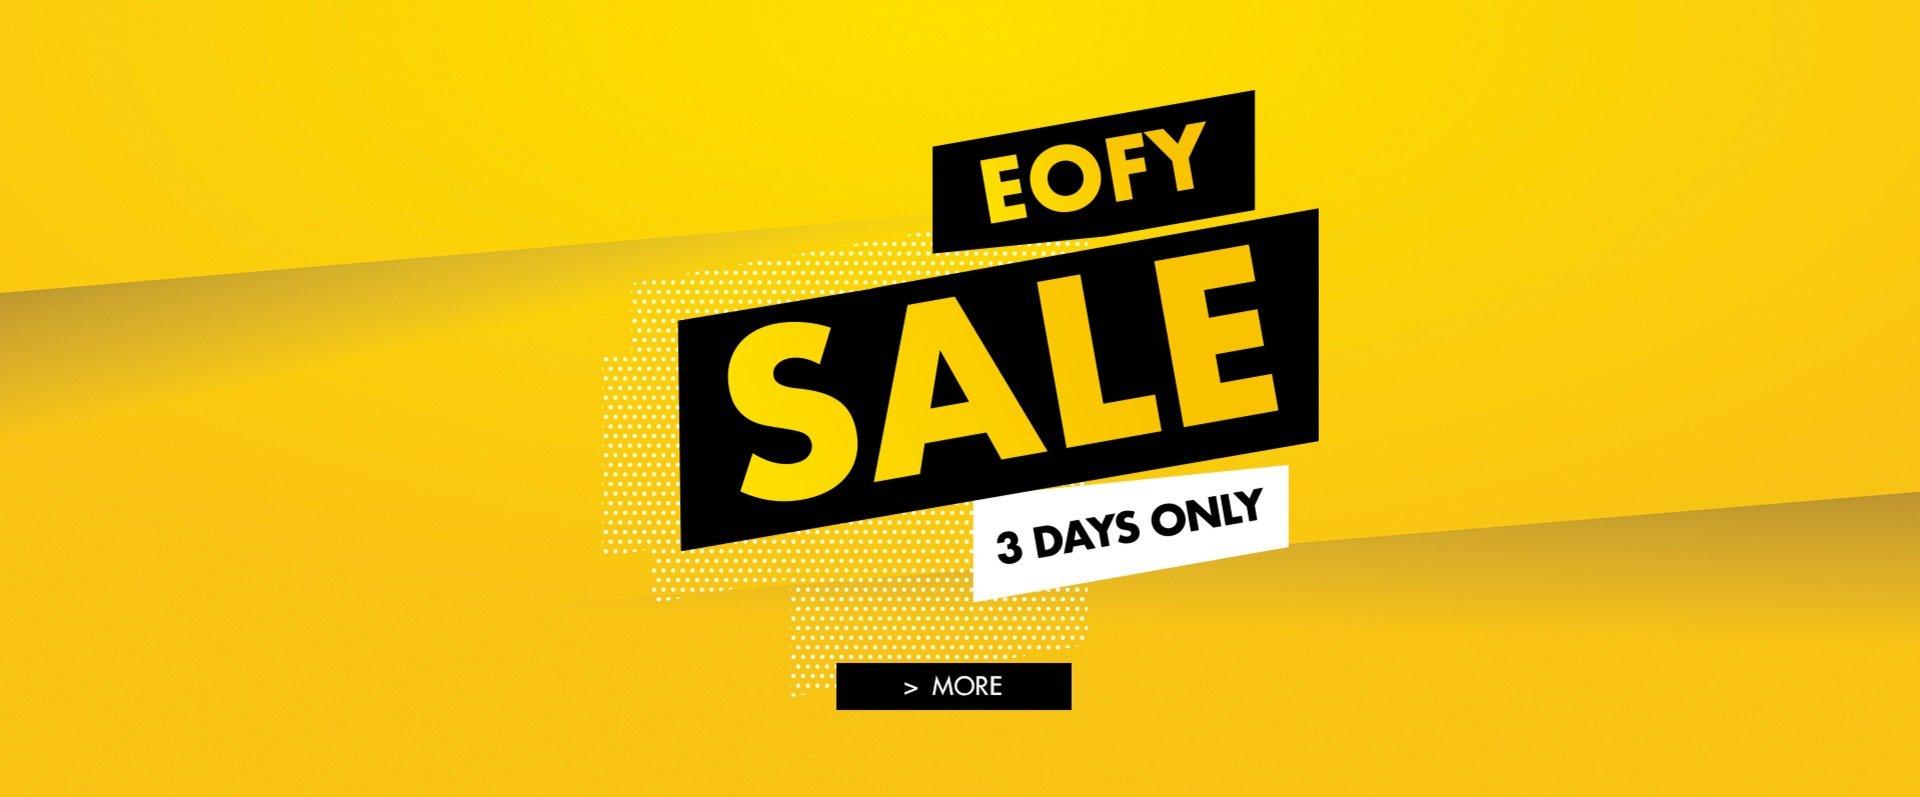 3 DAY EOFY SALE